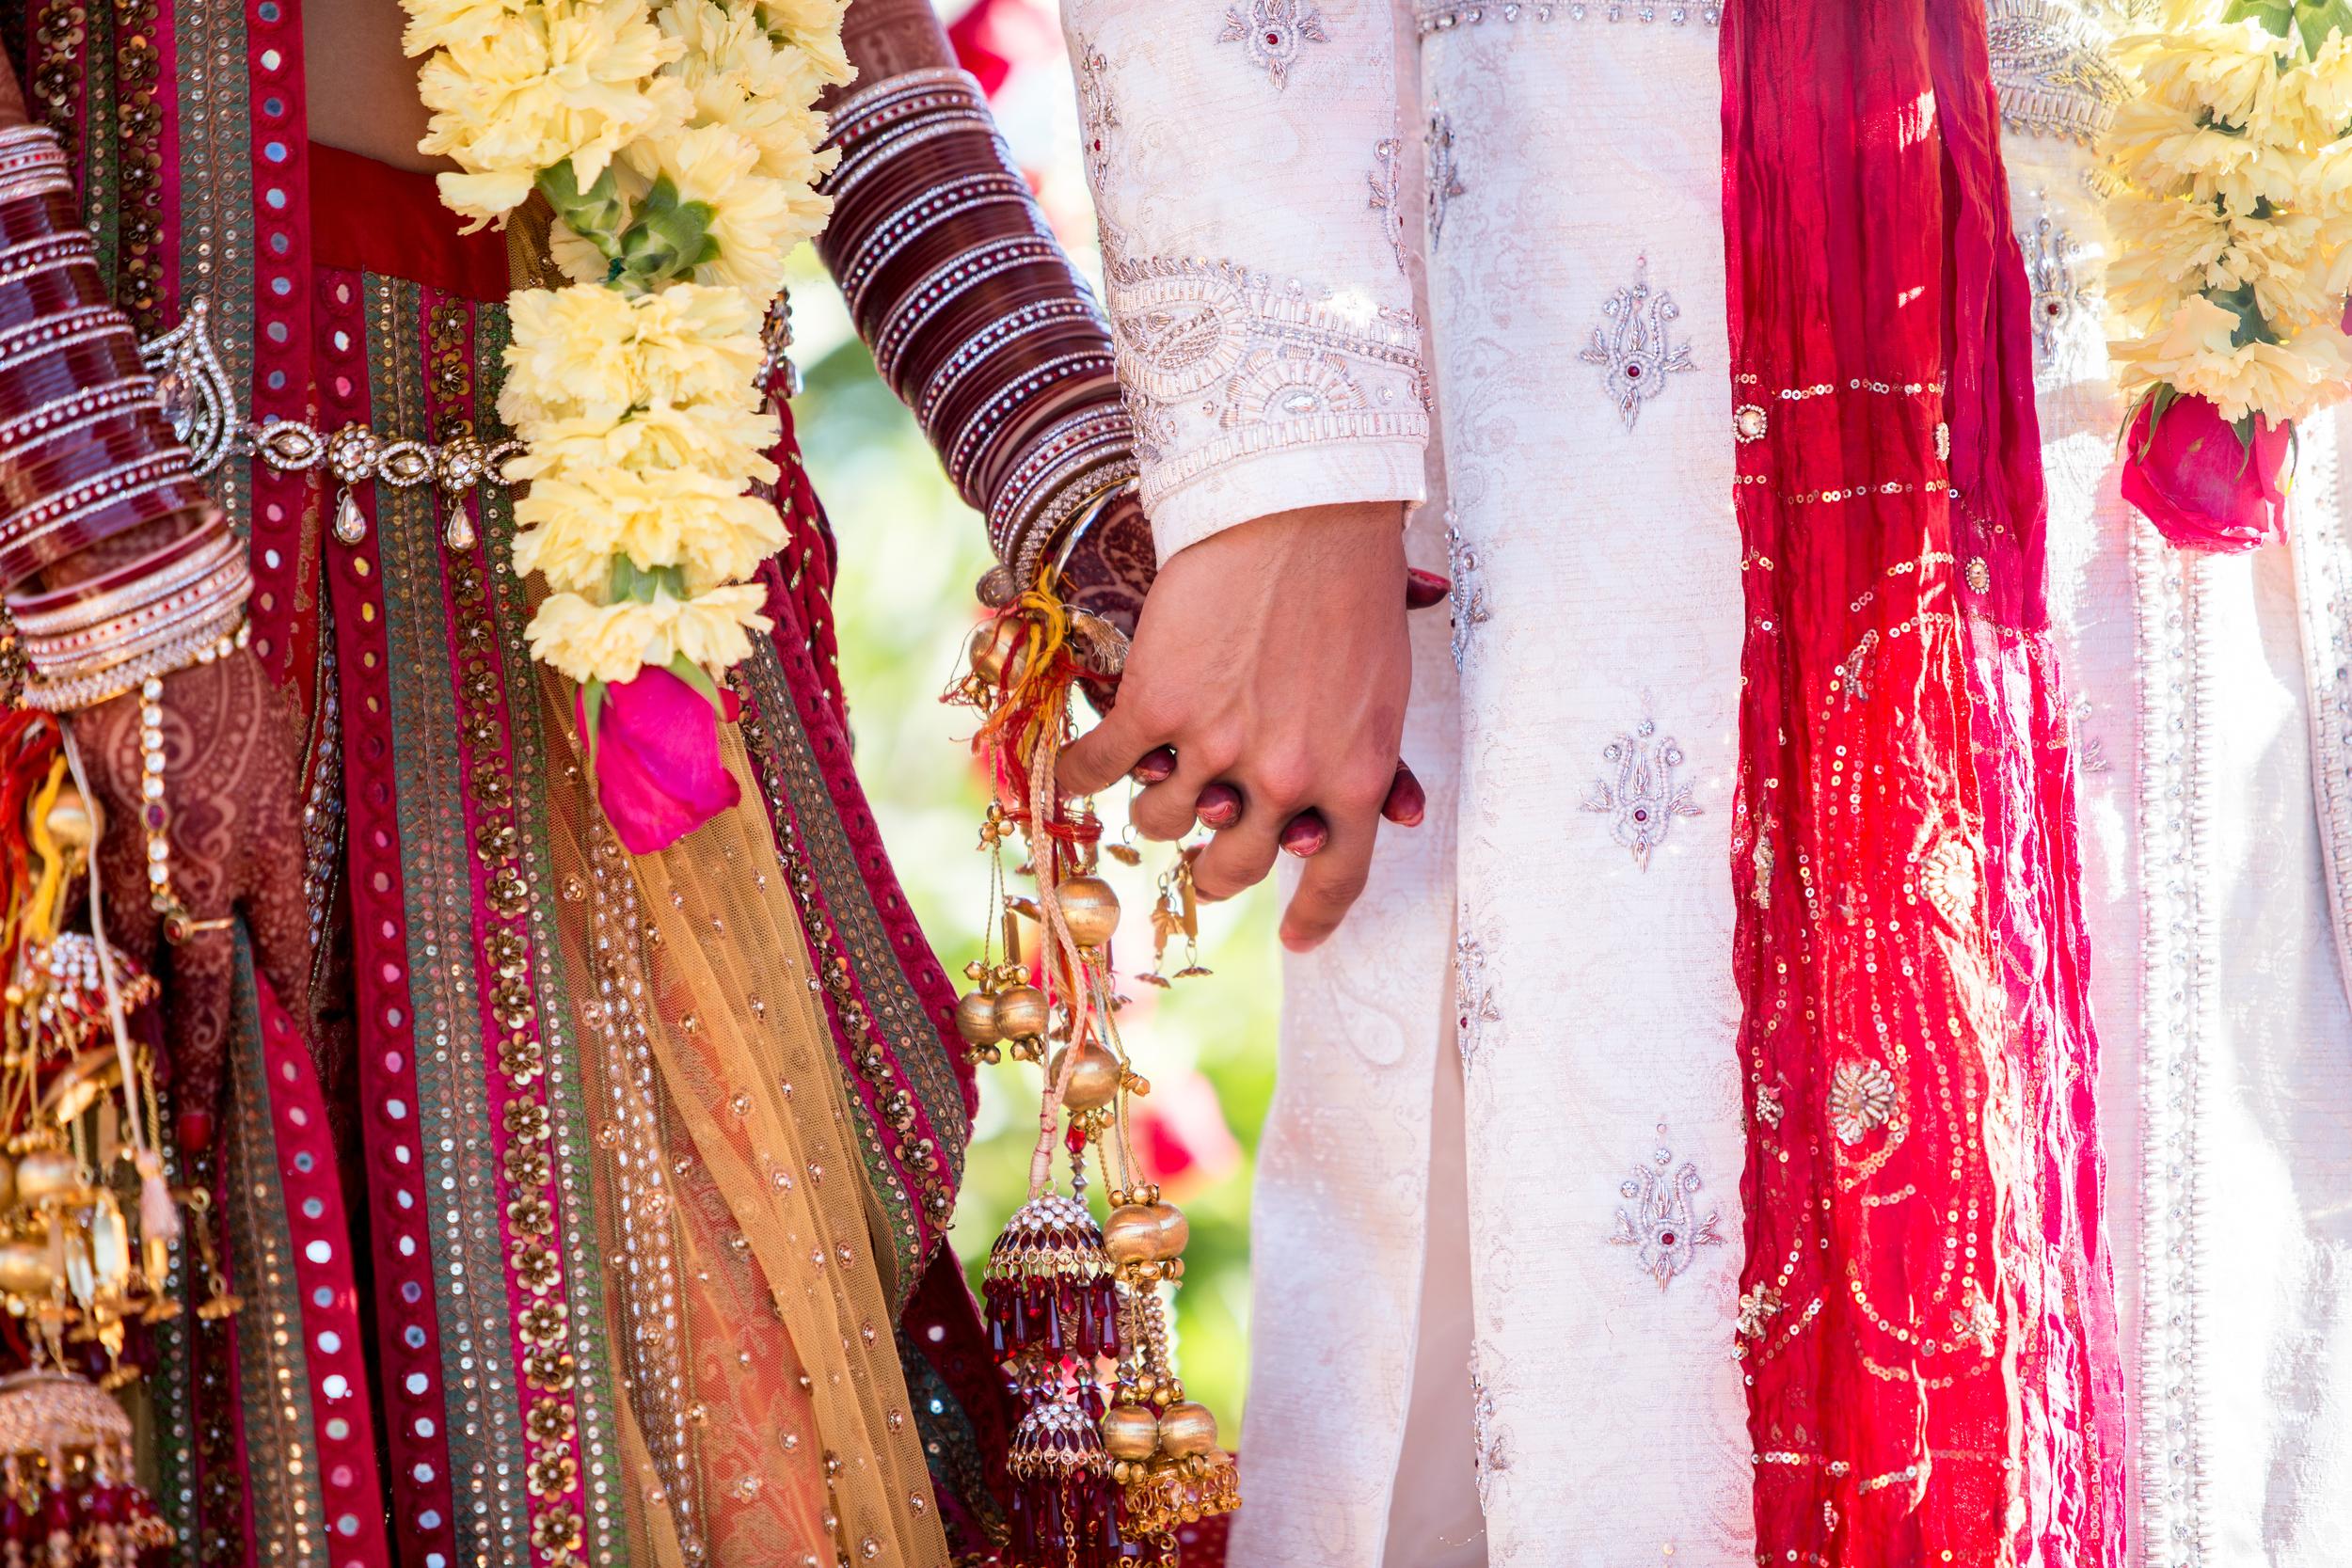 AnaisEvents_WeddingDocumentaryPhoto-Simi-Aneil - 060.jpg